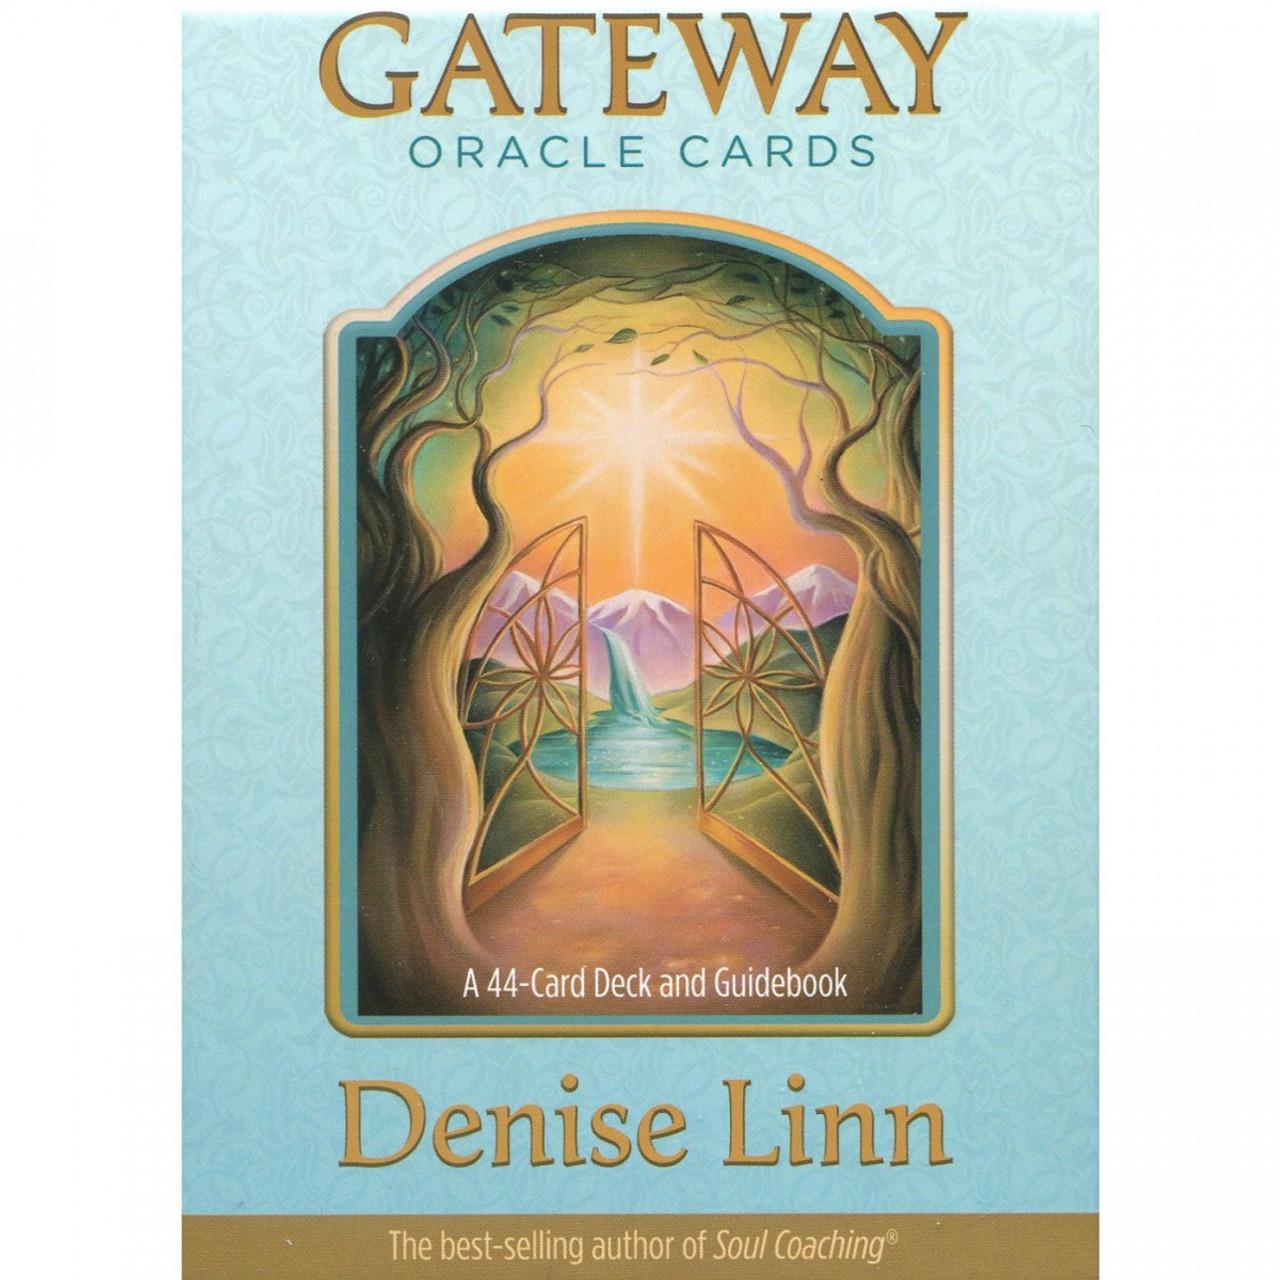 Gateway Oracle Cards by Denise Linn